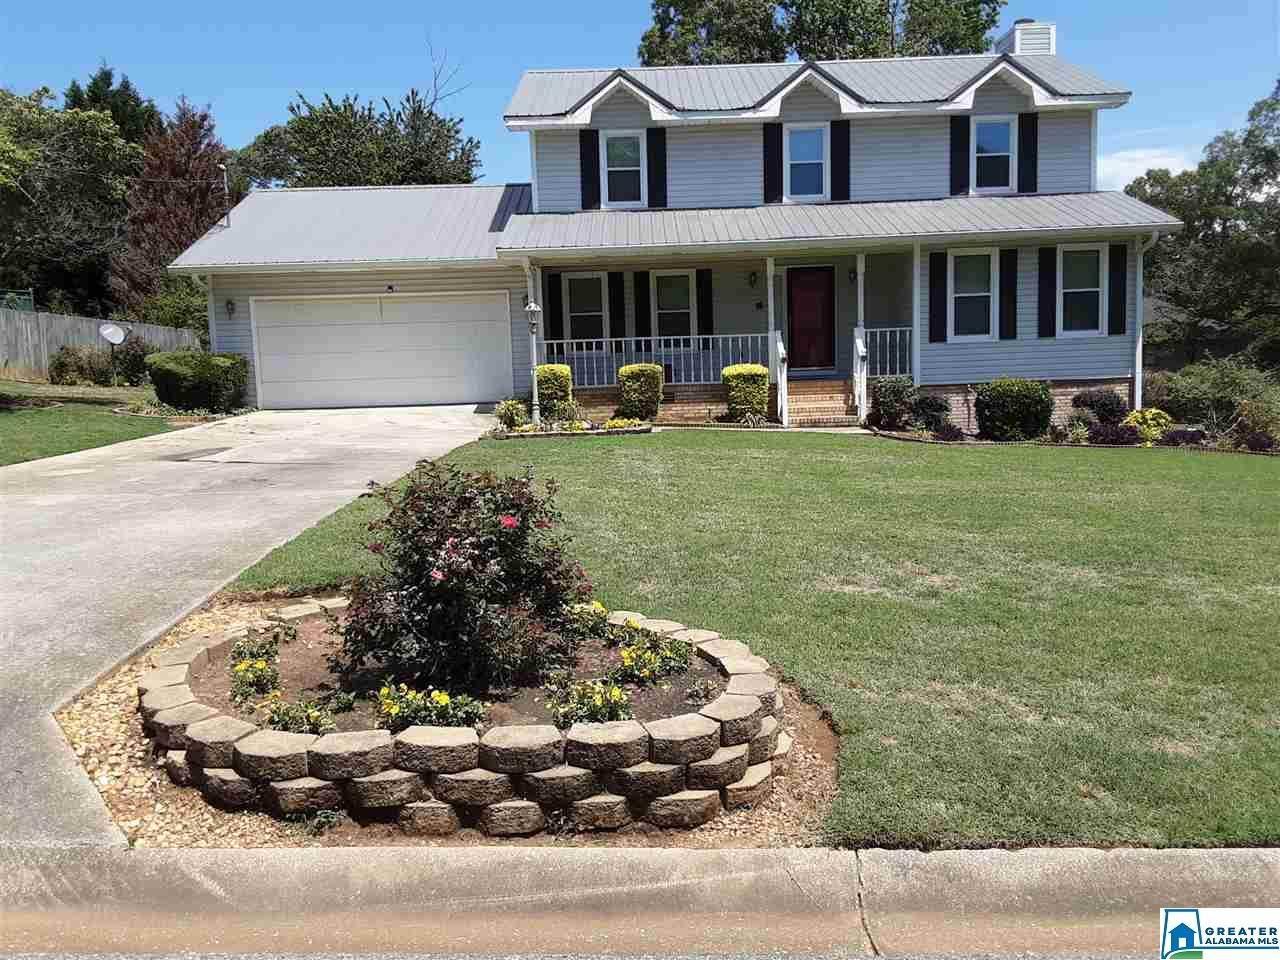 5021 Red Oak Dr - Photo 1